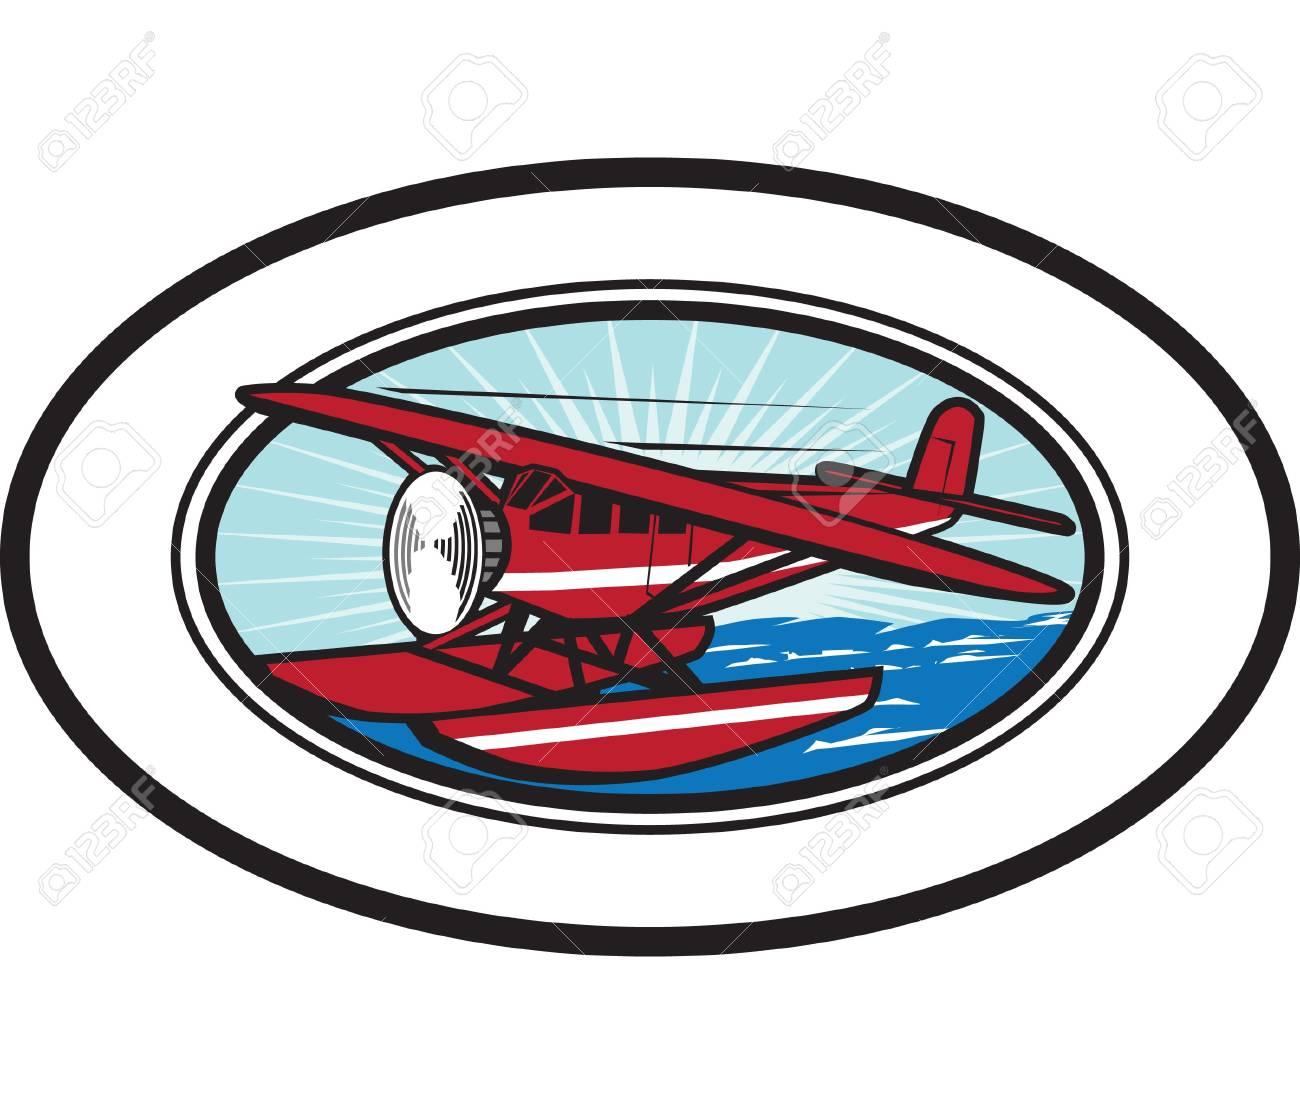 Waterplane Oval Stock Vector - 13179840